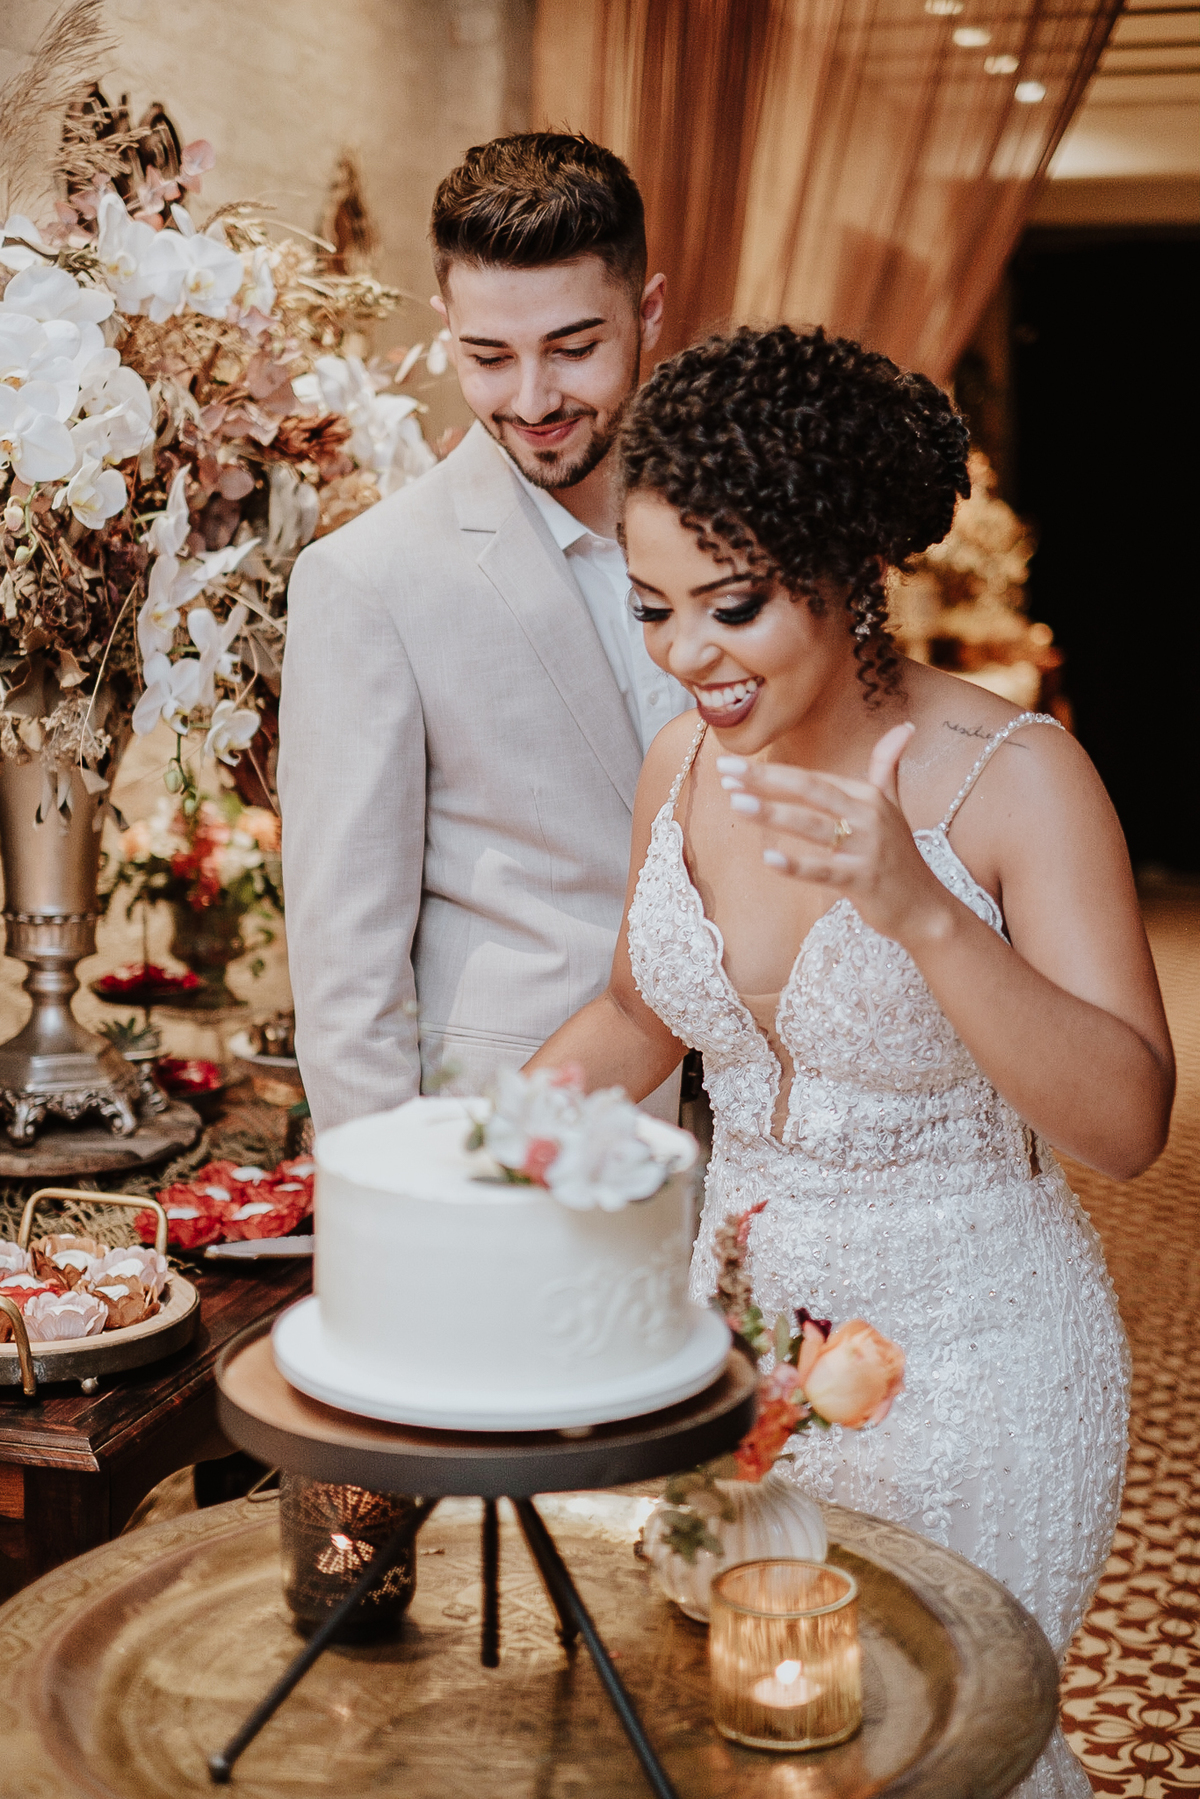 troca de aliancas noivos no altar cerimonia intimista casa quena fotos por caio henrique  retrato dos noivos